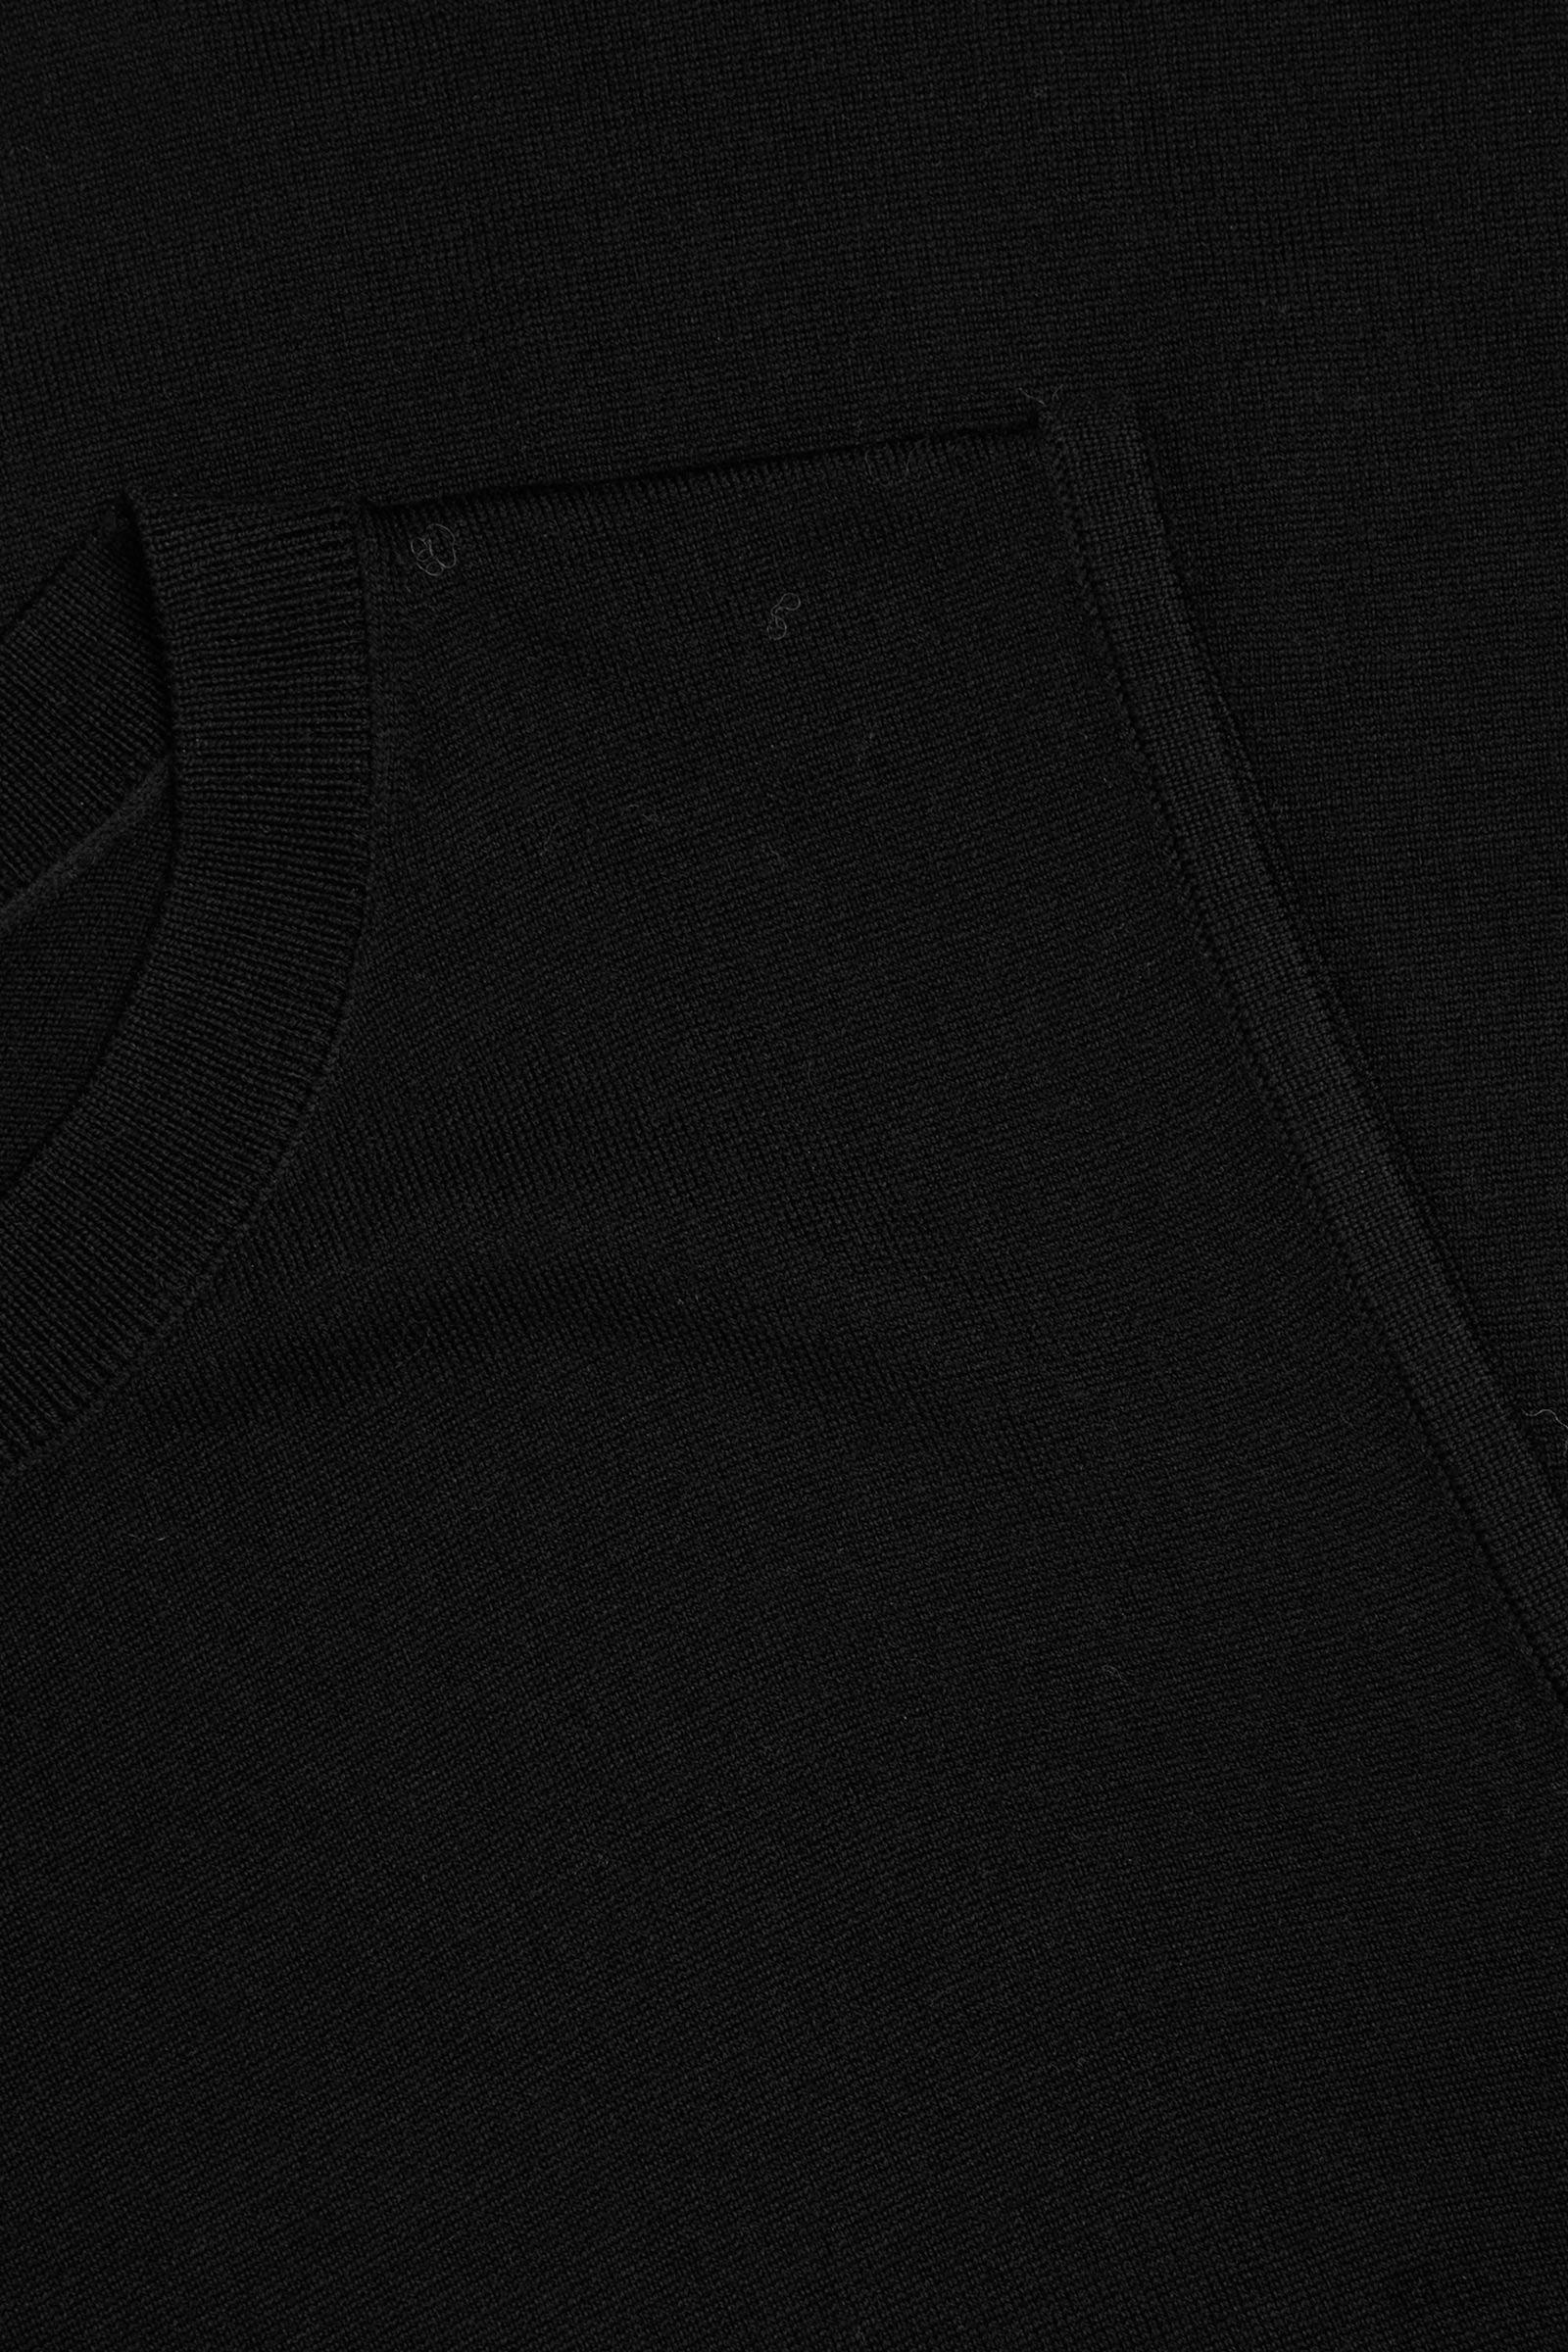 COS 니티드 A라인 메리노 울 드레스의 블랙컬러 Detail입니다.